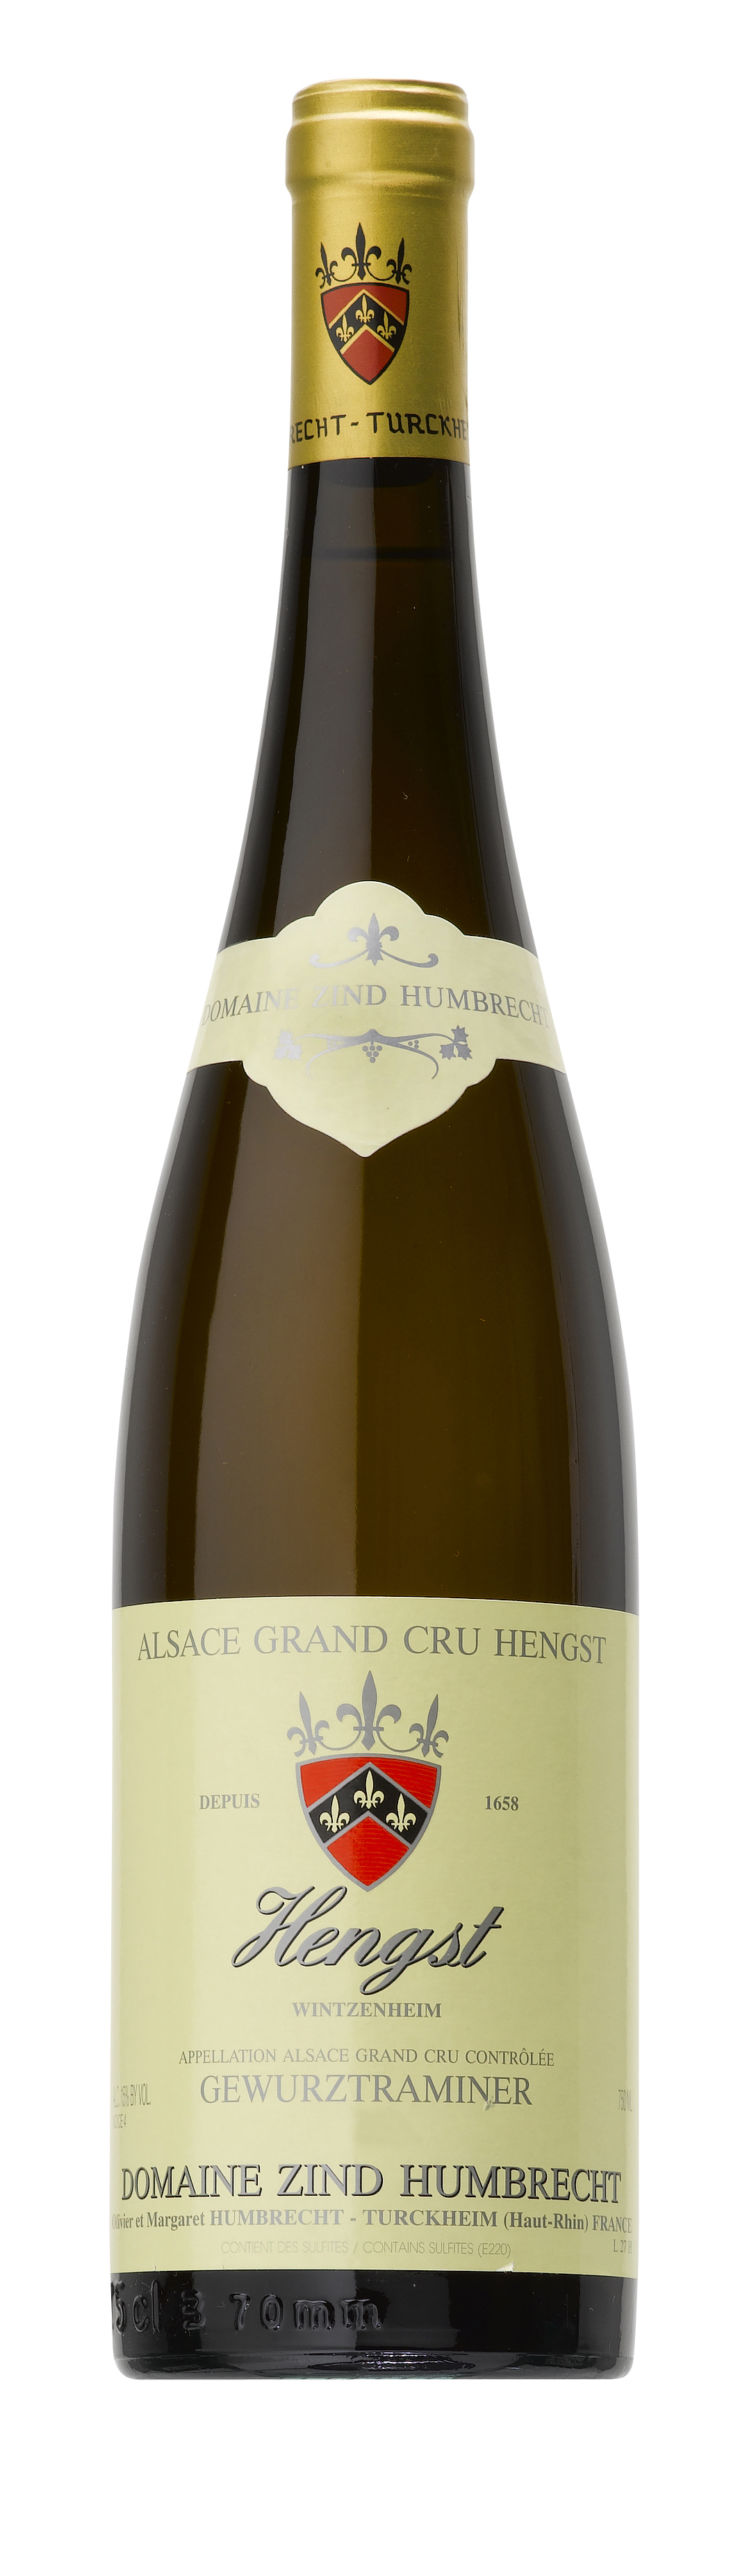 Alsace Grand Cru Hengst Gewurztraminer